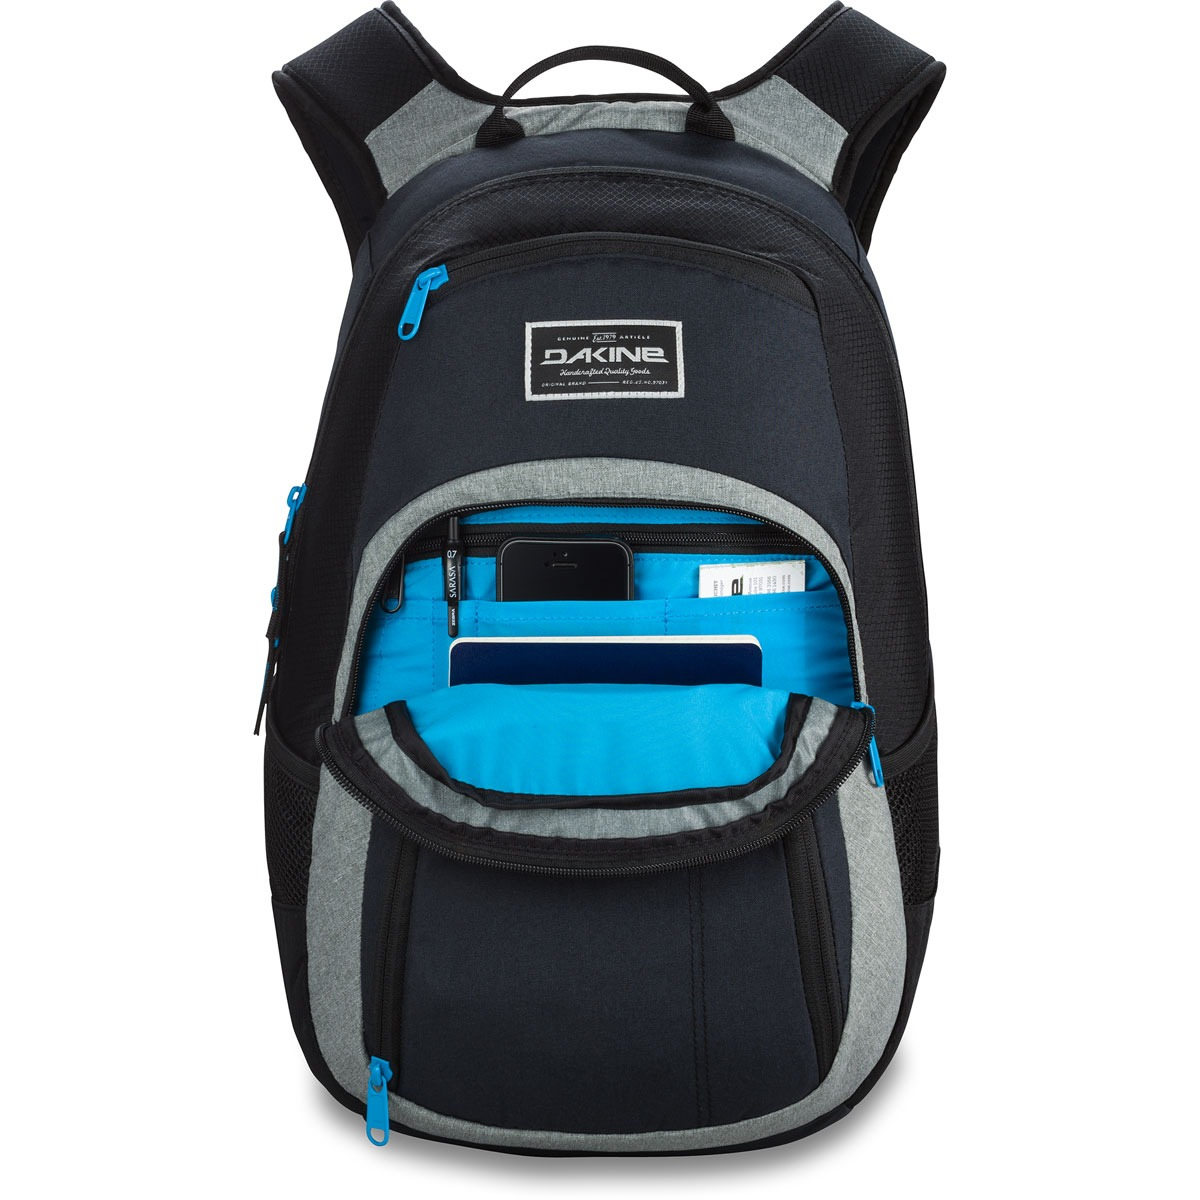 Cestovní taška Dakine Campus 25L Tabor CAMPUSDLX33L-TABOR-610934146578 10001284 TABOR-71X MAIN  - ukázka interiéru batohu ... 6ace2f4abe